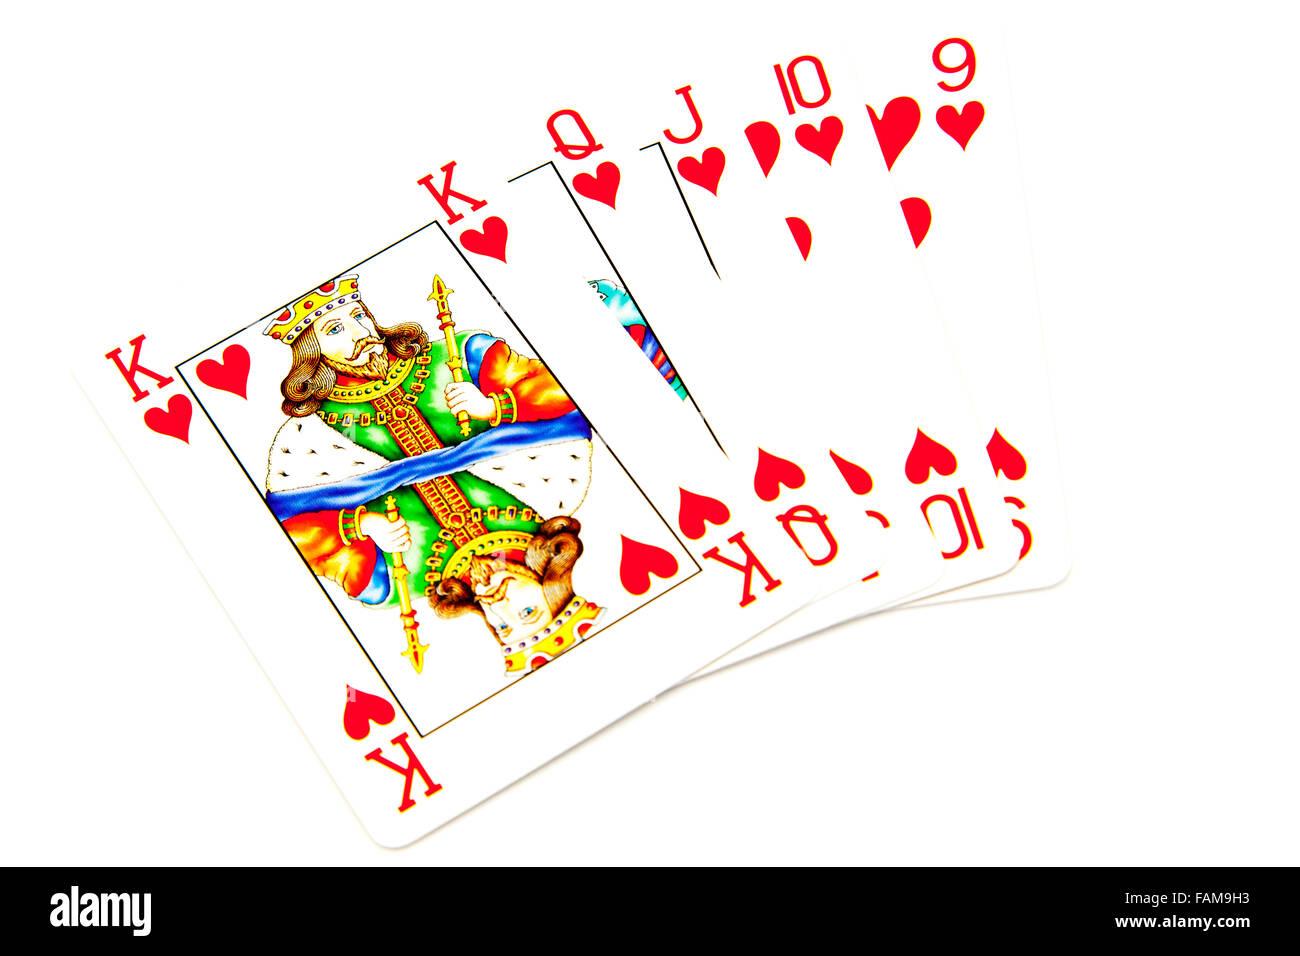 Poker straight same suit